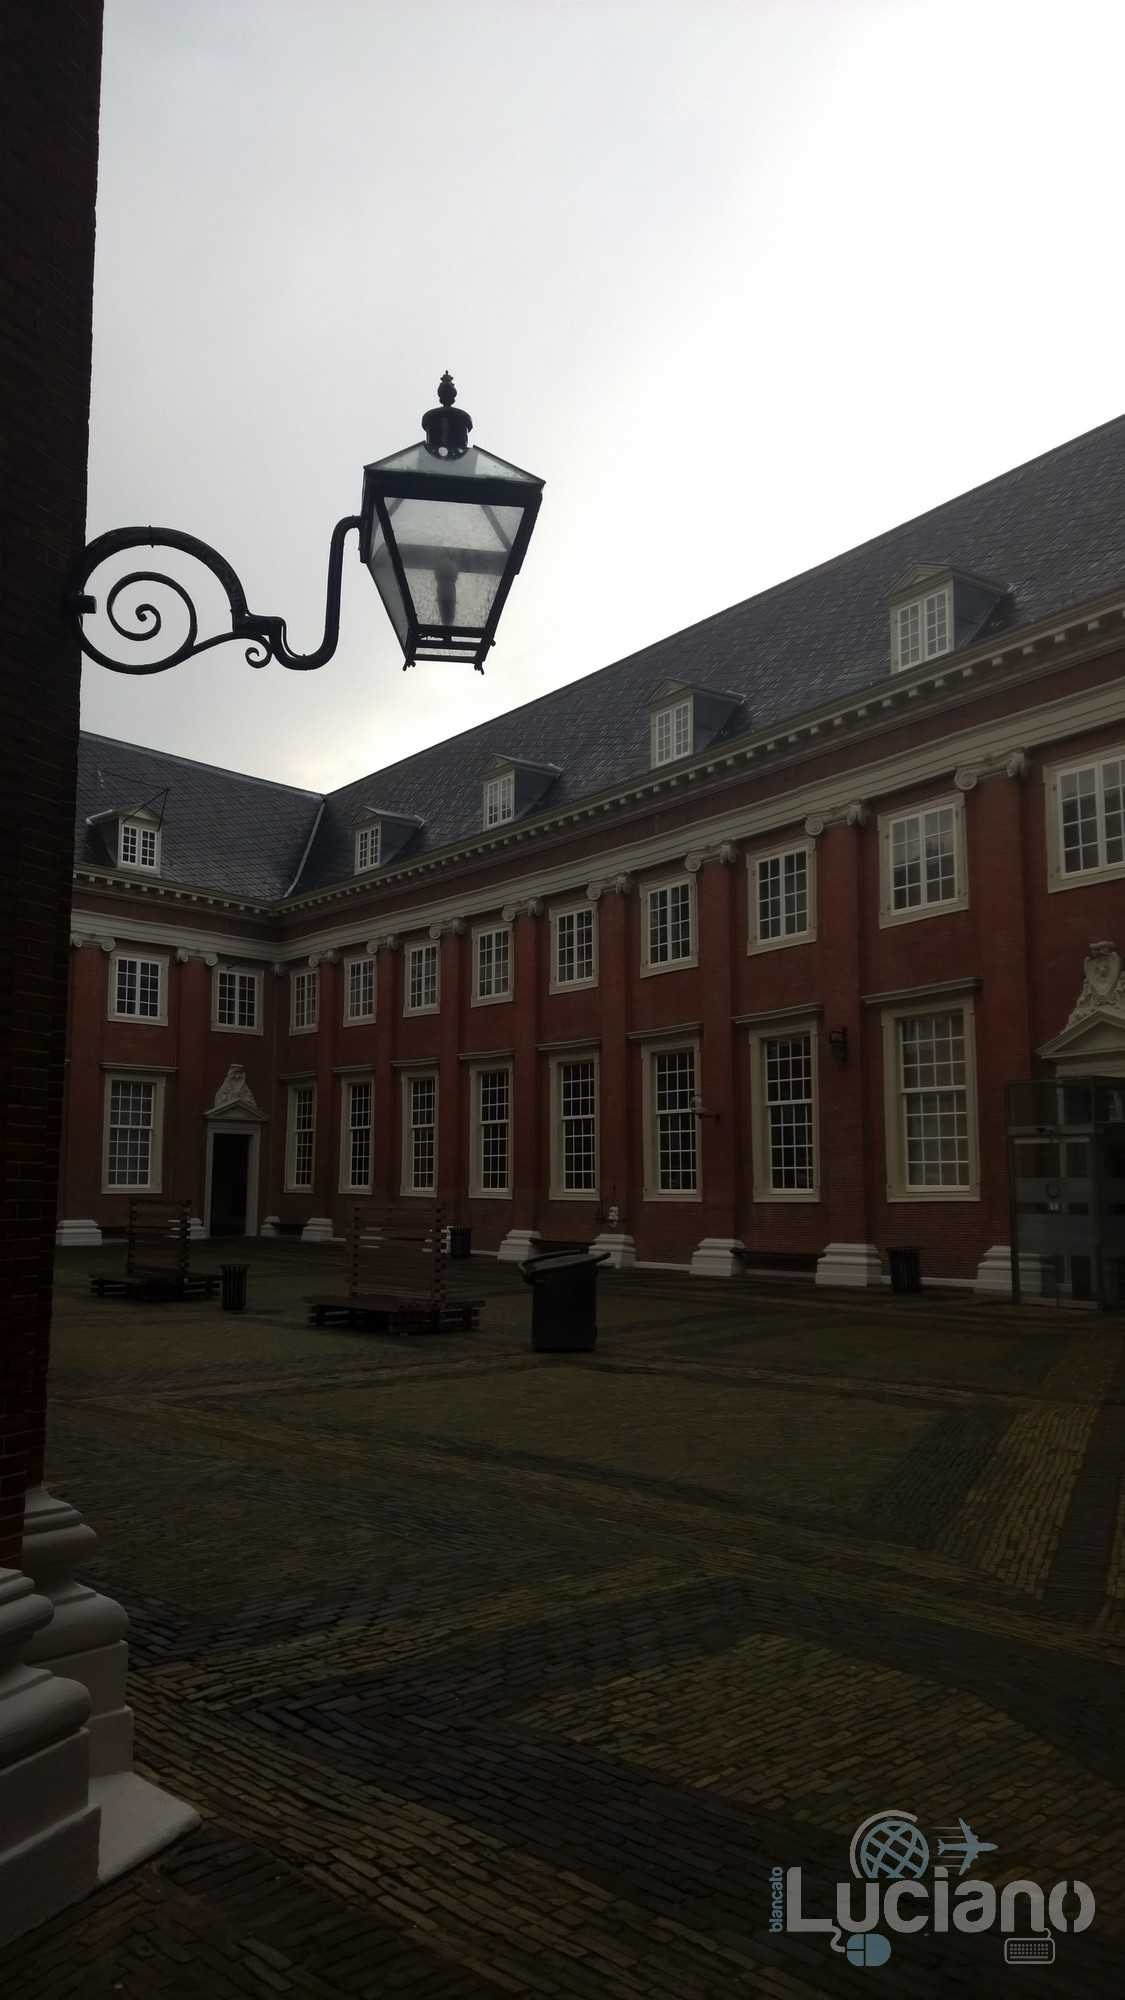 amsterdam-2014-vueling-lucianoblancatoit (151)